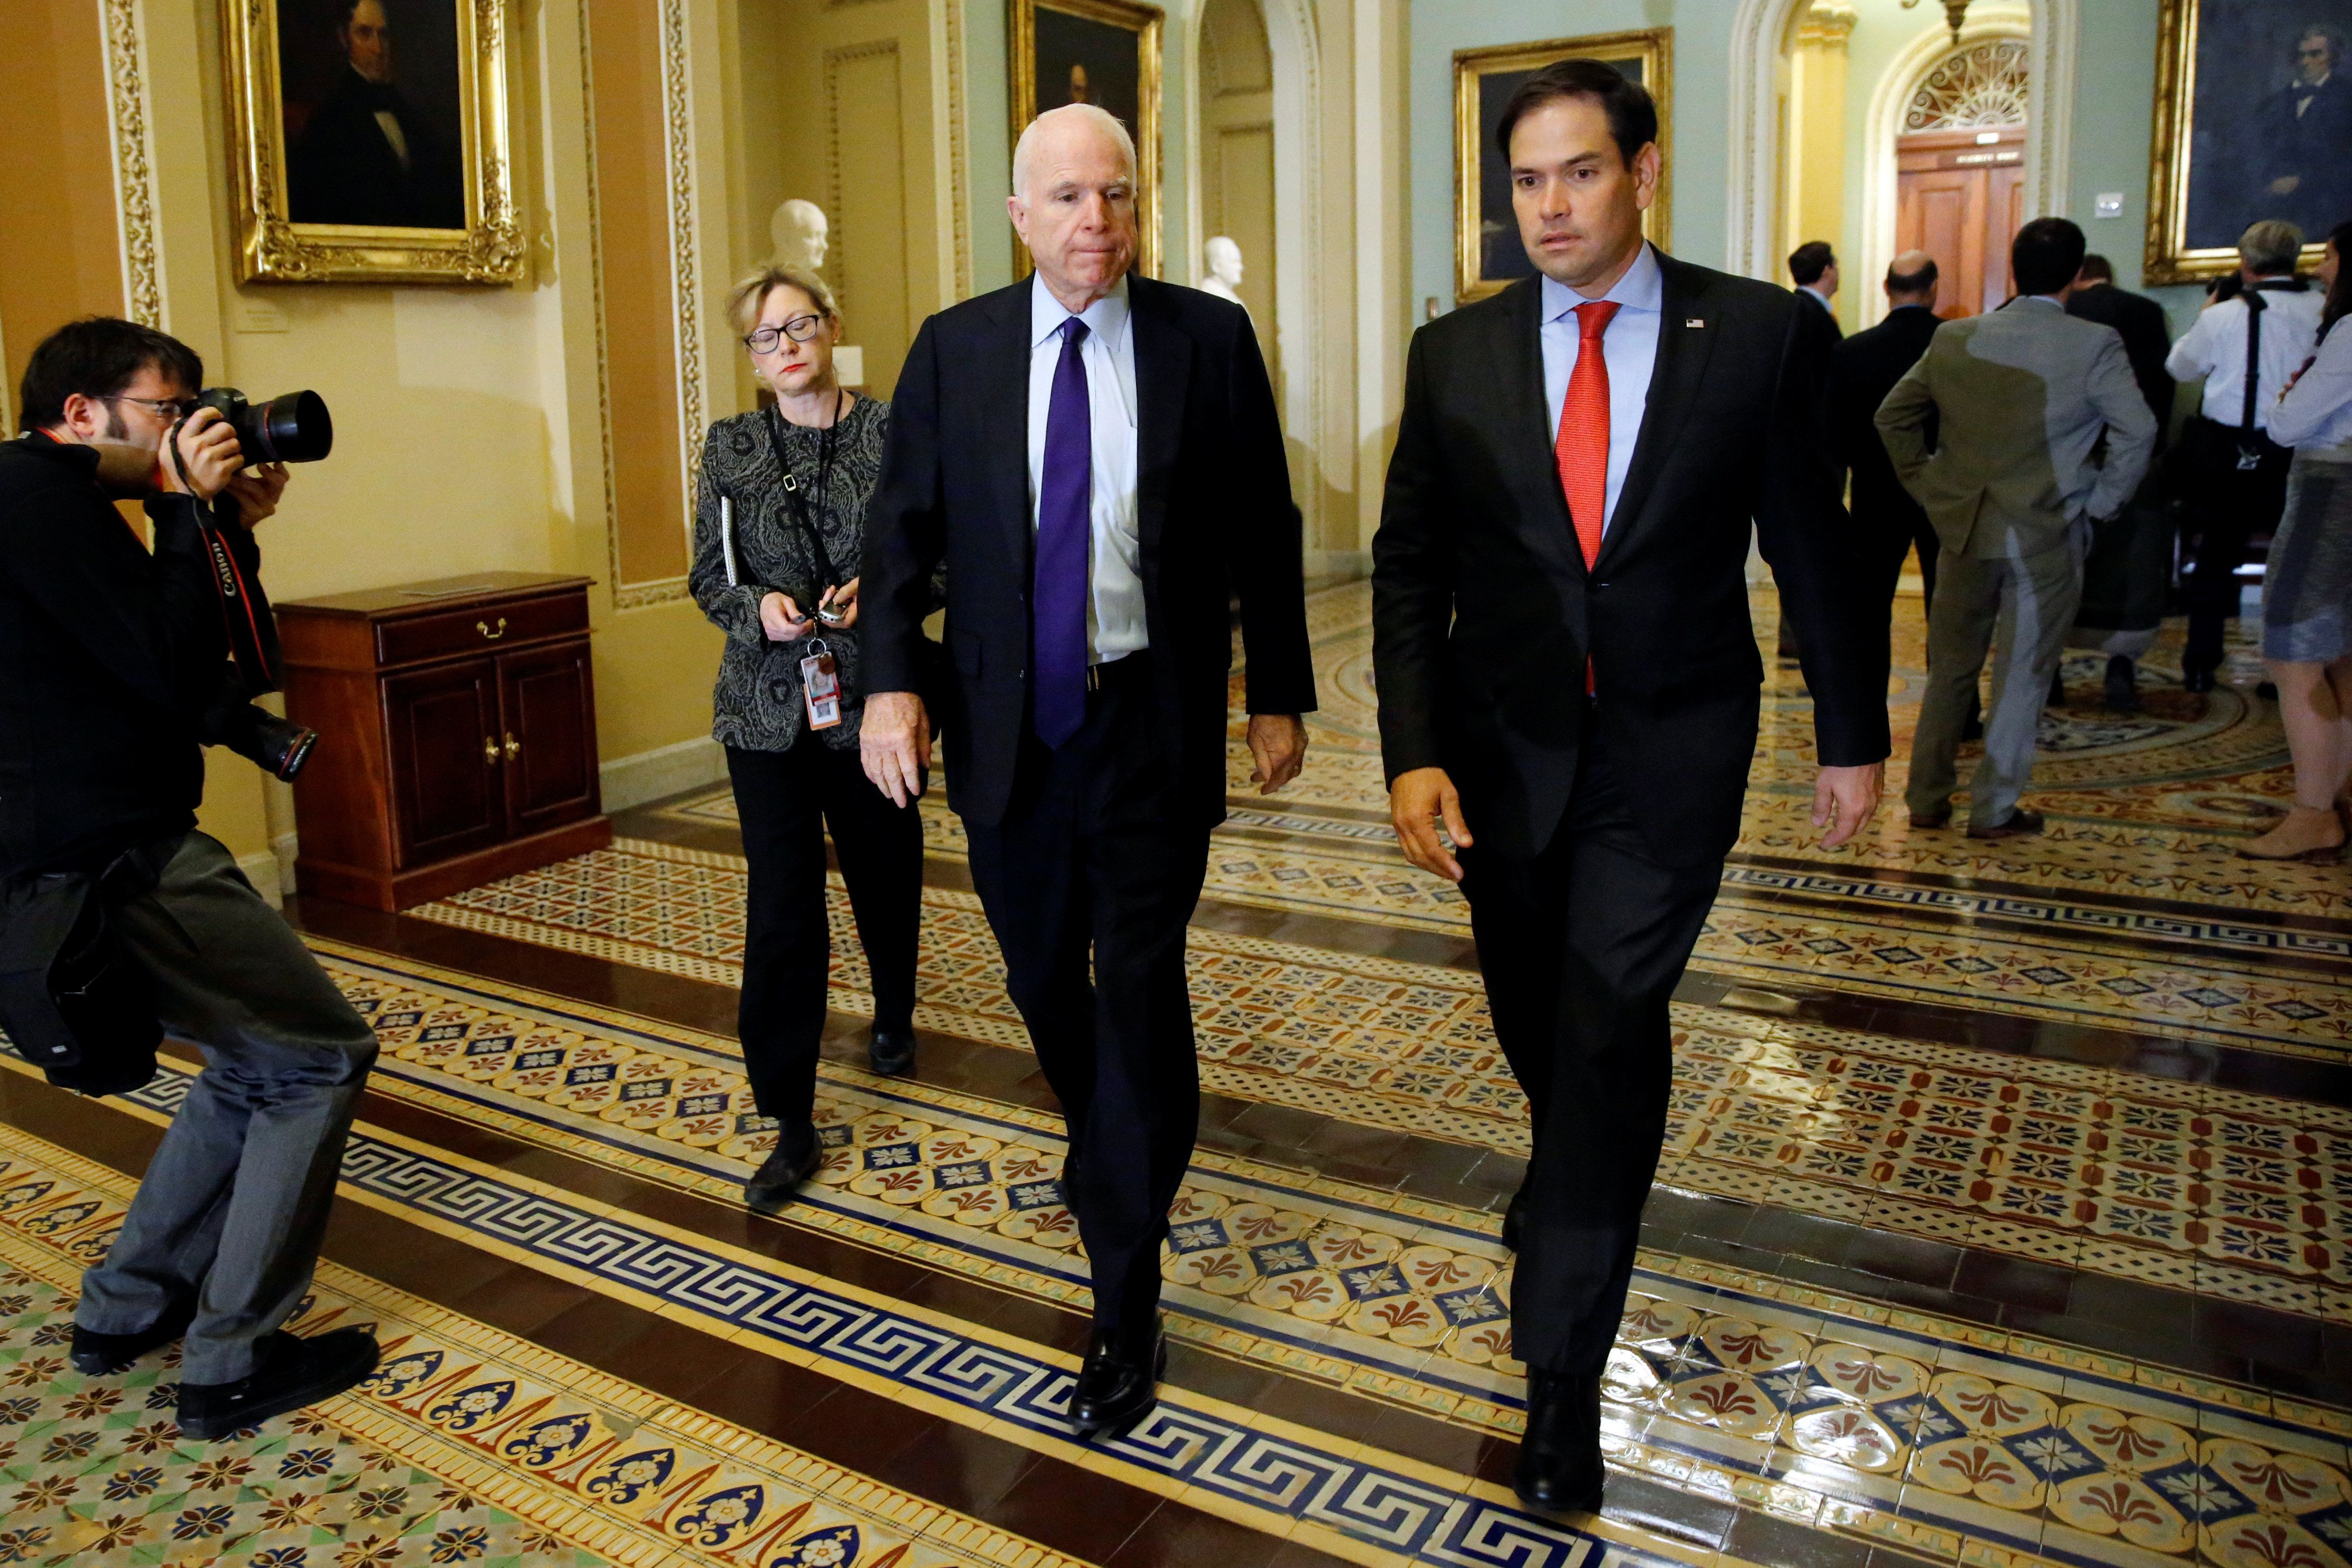 U.S. Senator John McCain (R-AZ) (2nd R) and Senator Marco Rubio (R-FL) (R) arrive for Senate Republican party leadership elections at the U.S. Capitol in Washington, DC, U.S. November 16, 2016. REUTERS/Jonathan Ernst